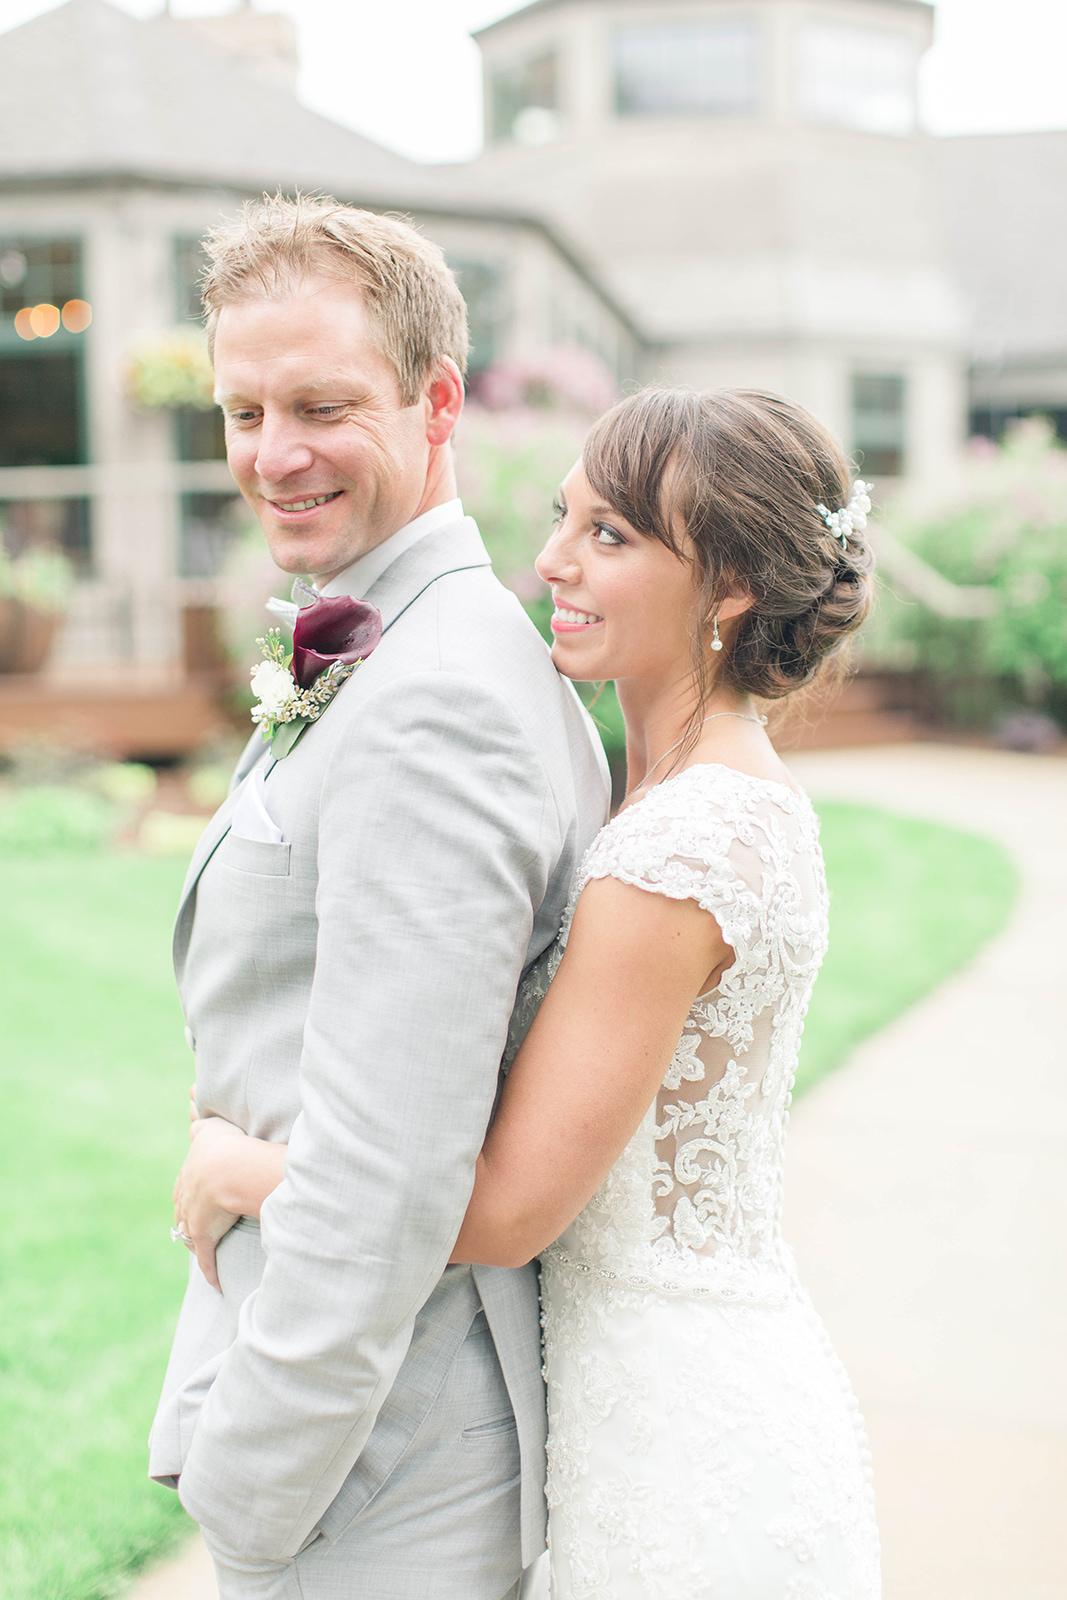 A Romantic Wausau Country Club Wisconsin Wedding - The Overwhelmed Bride Wedding Blog